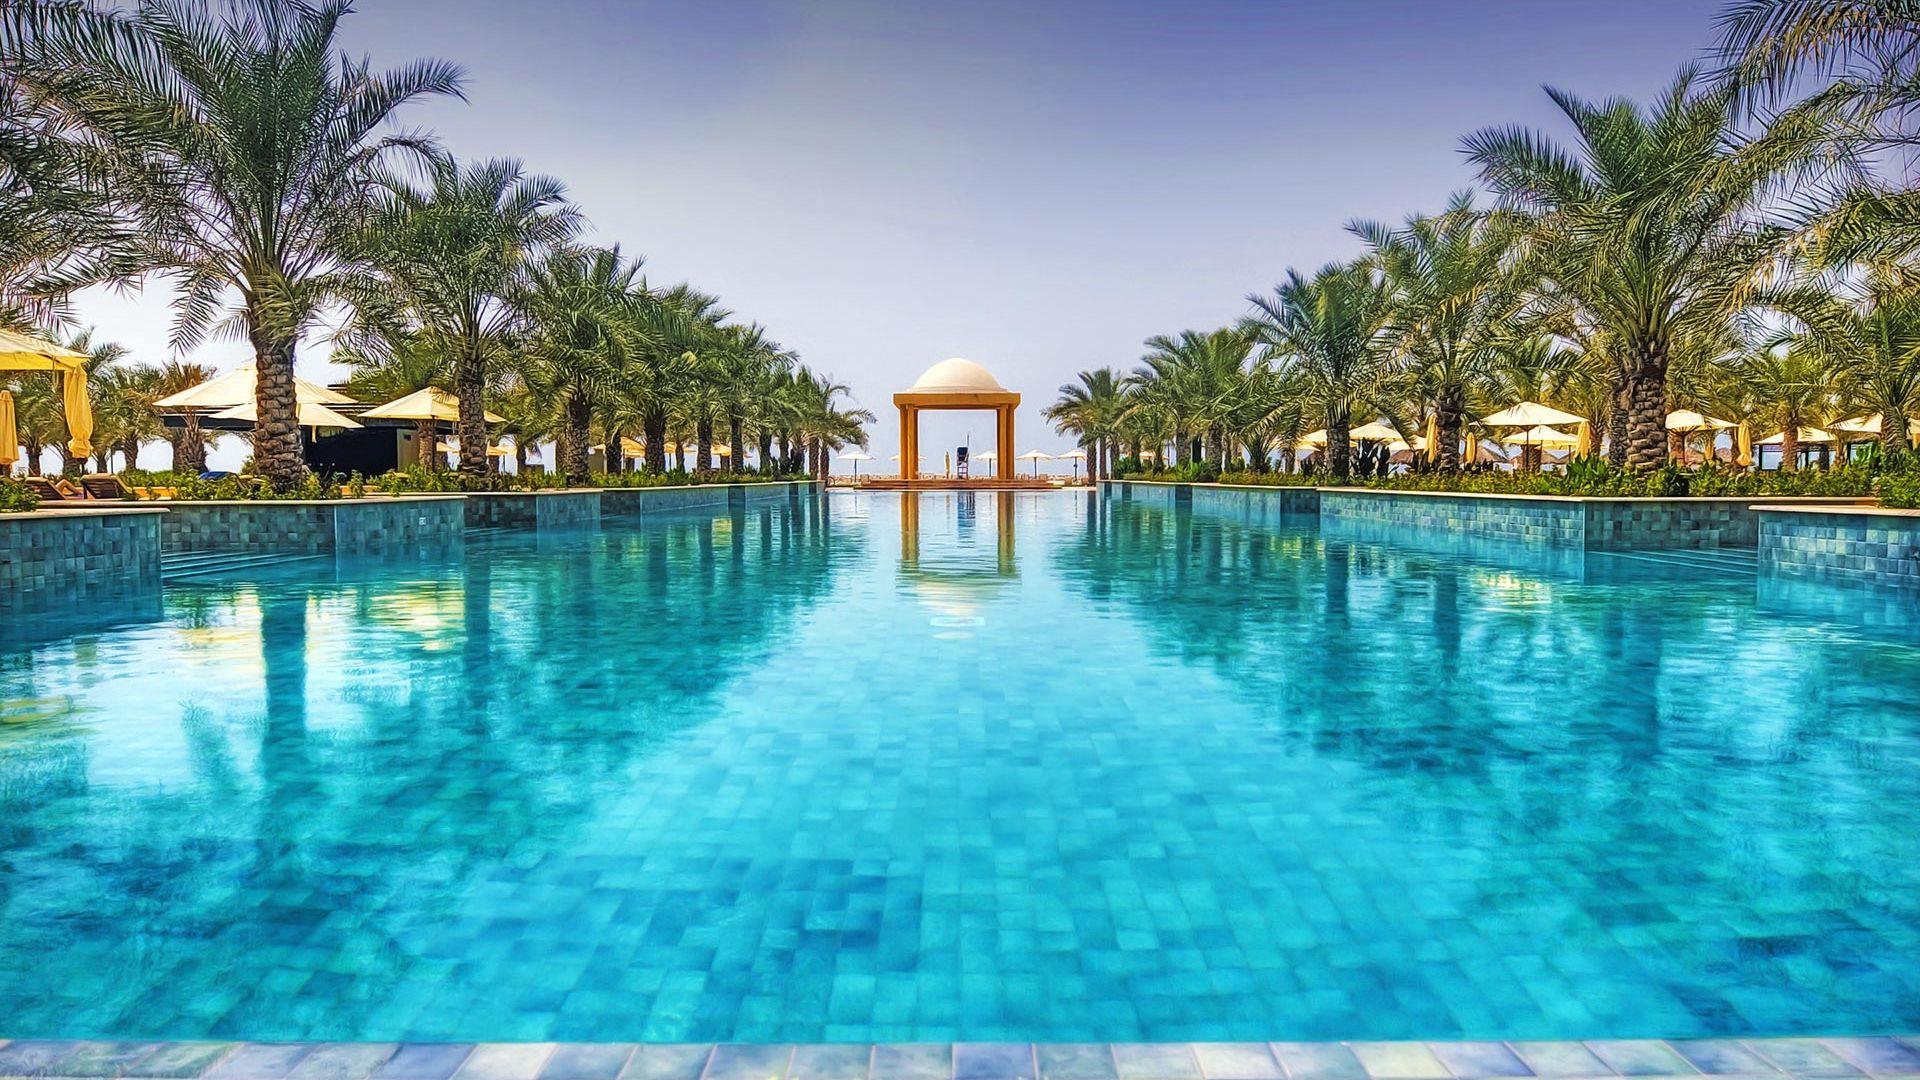 Craciun 2021 - Sejur charter Ras Al Khaimah, EAU, 8 zile